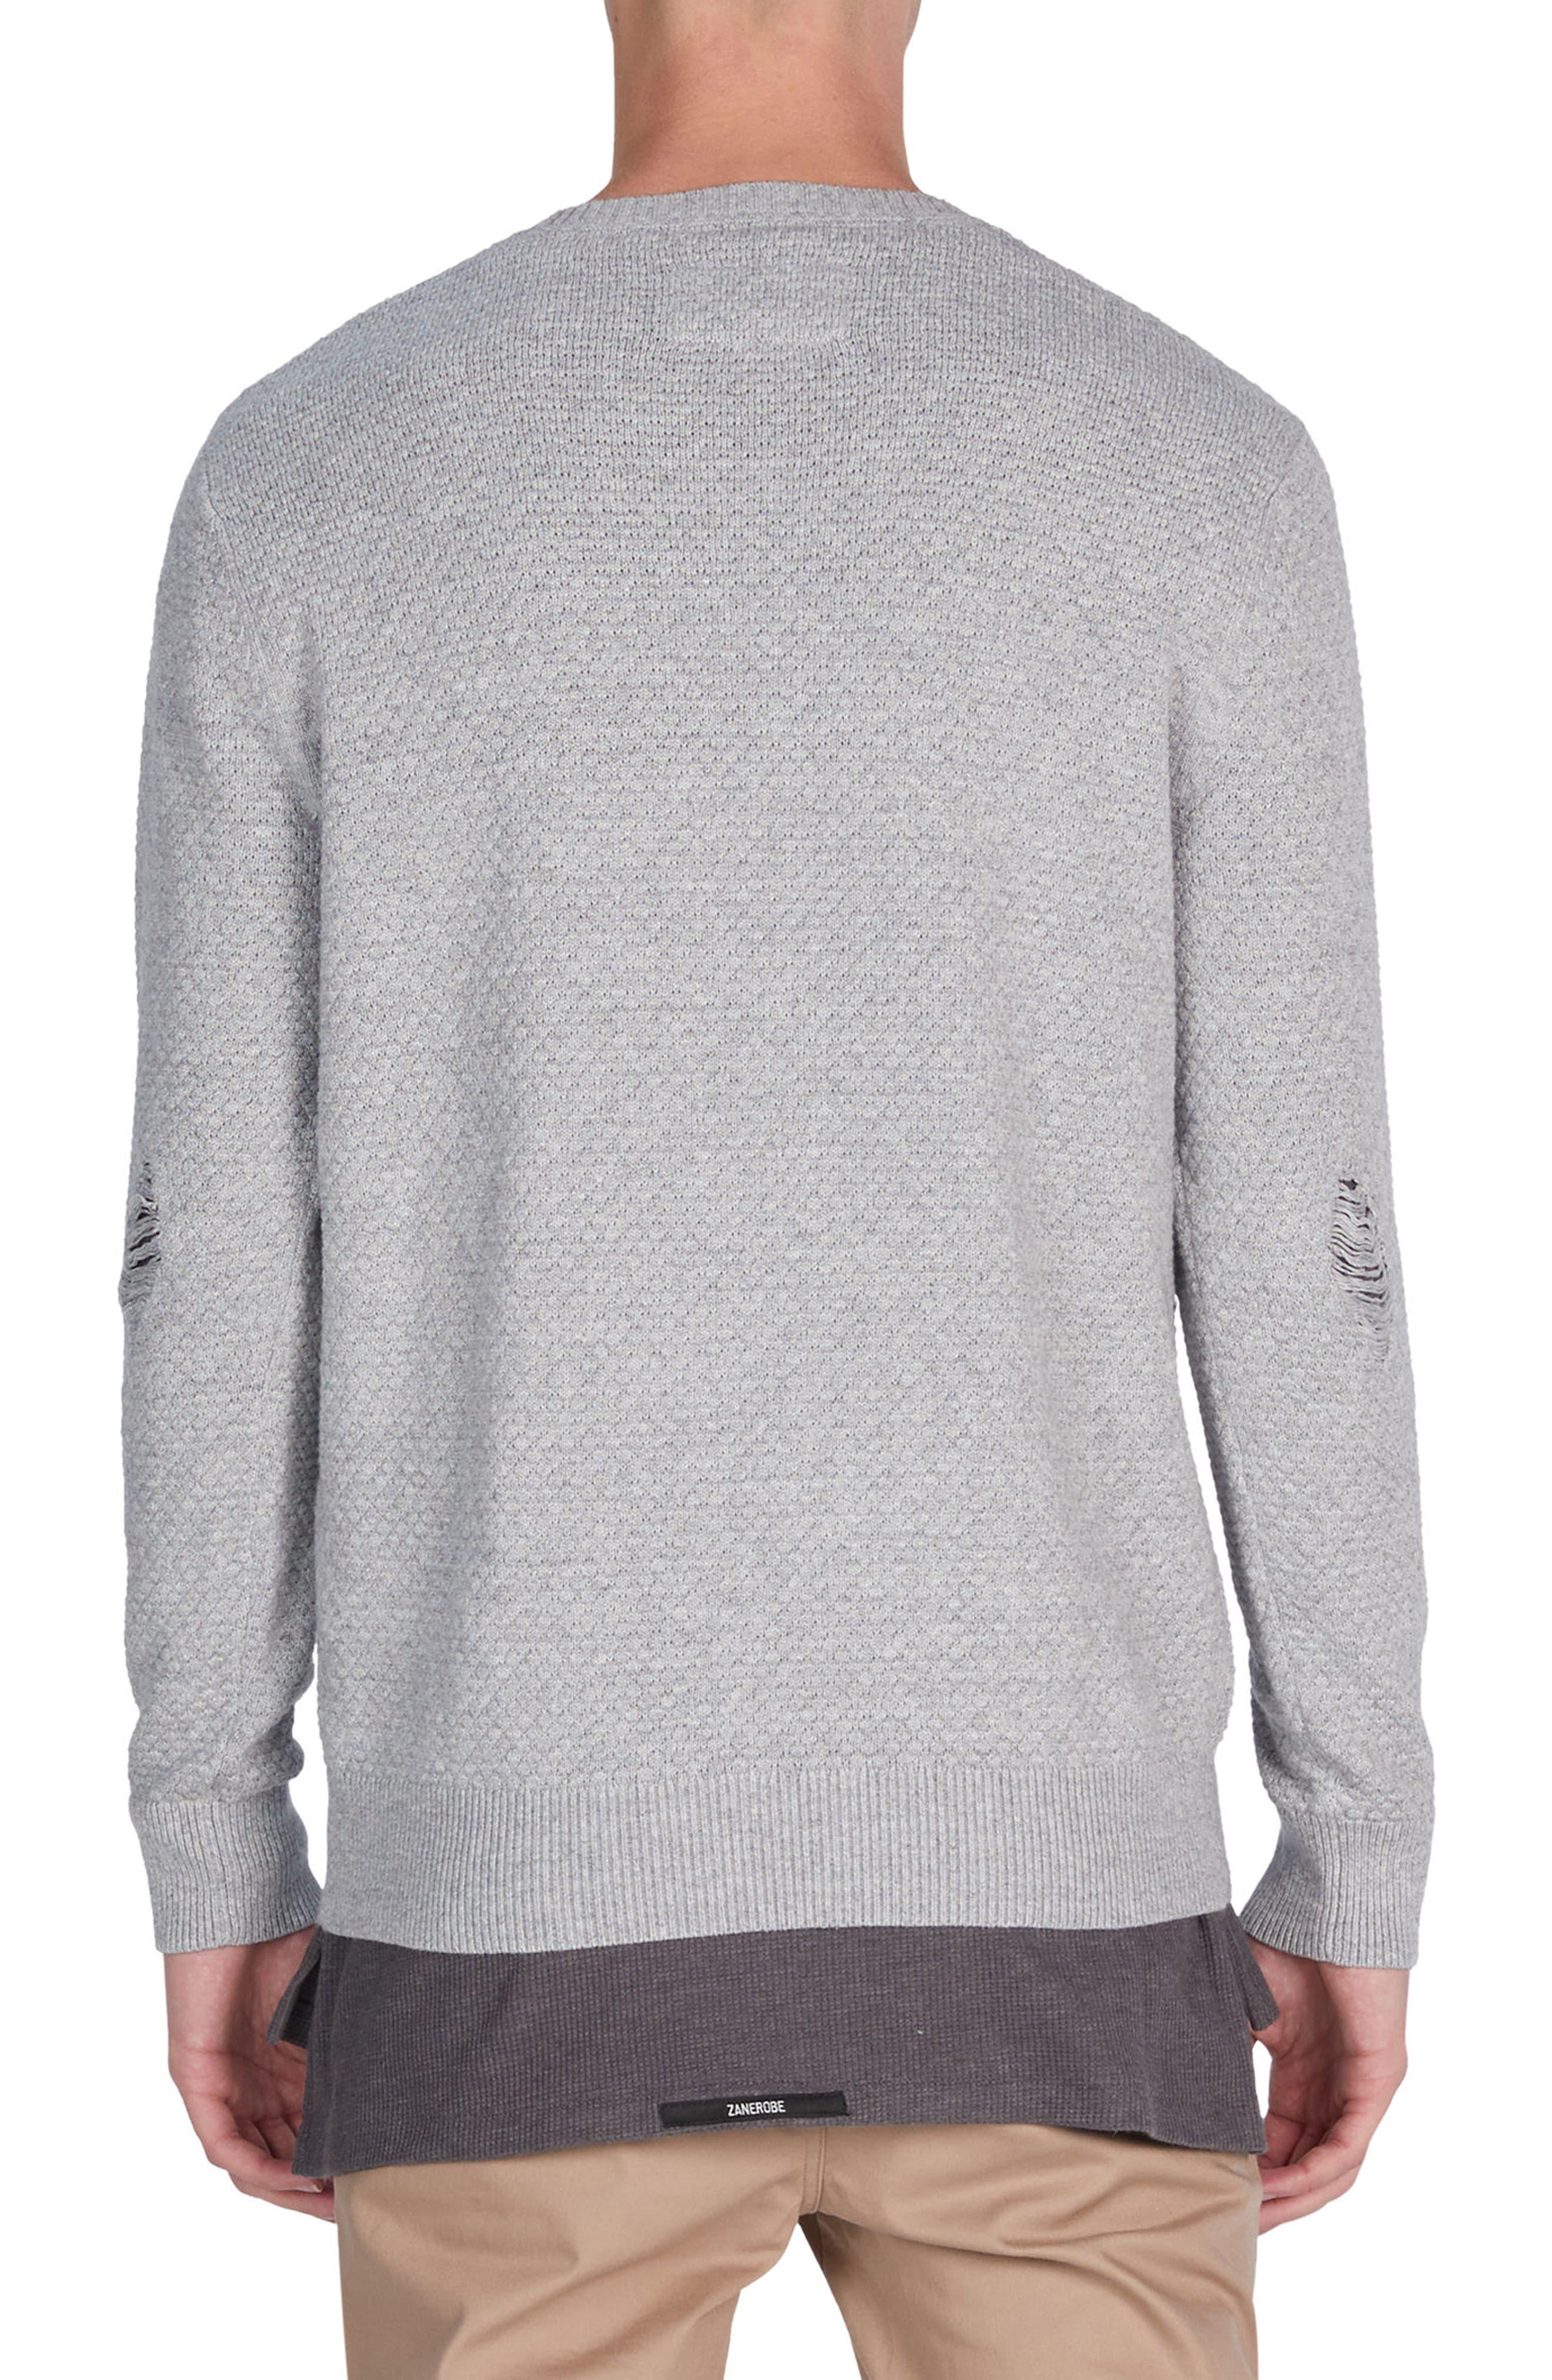 Grip Crewneck Sweater,                             Alternate thumbnail 2, color,                             Grey Marle